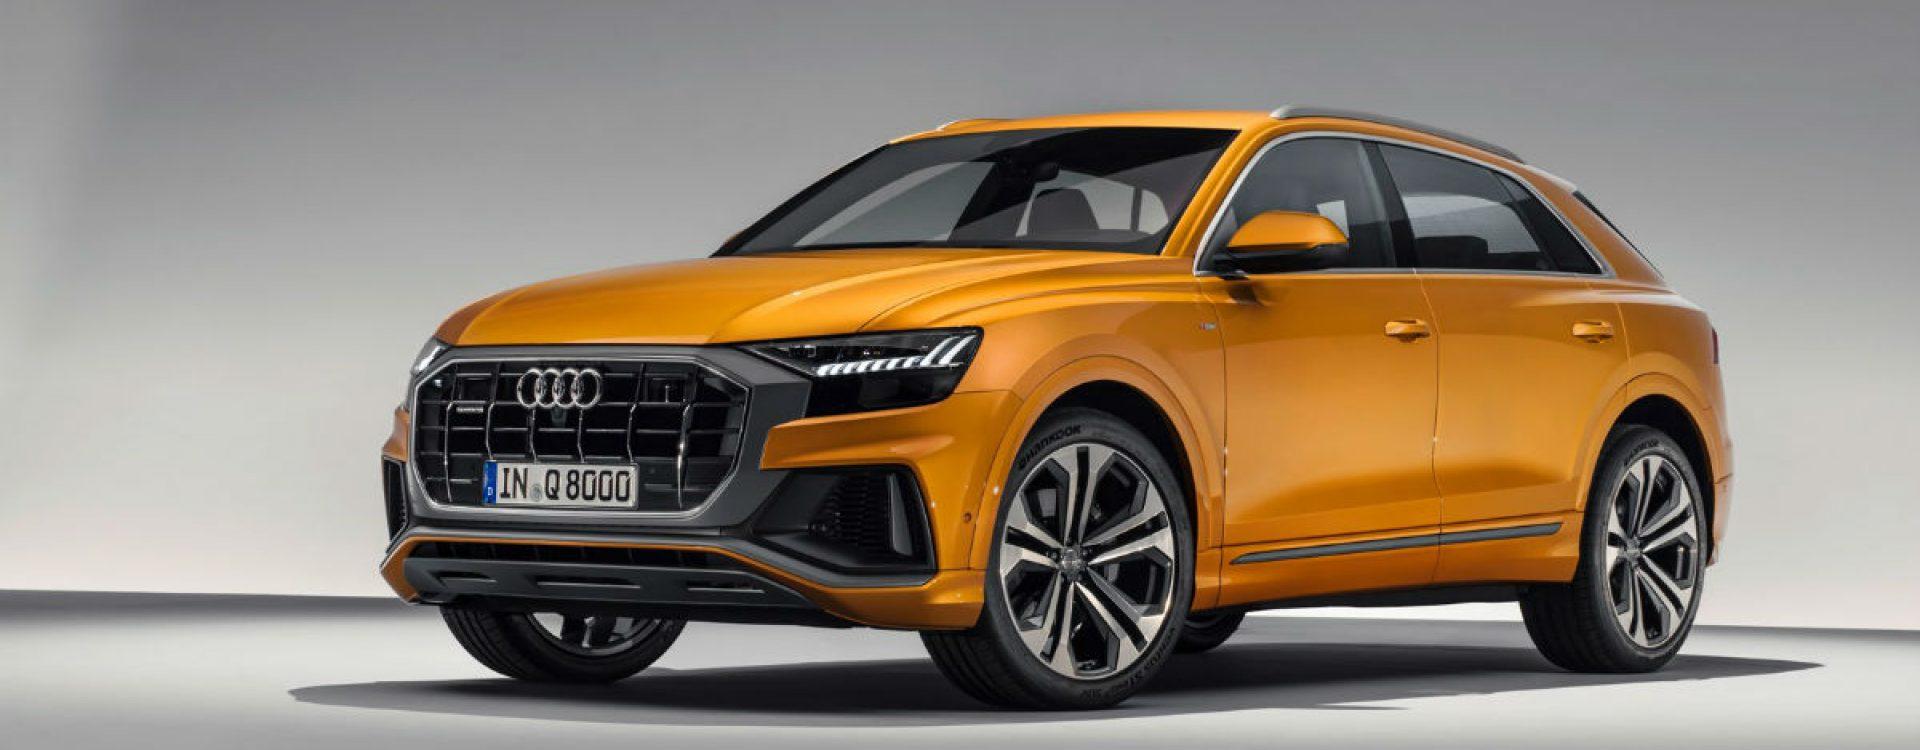 Cena Nowego Audi Q8 Bhim